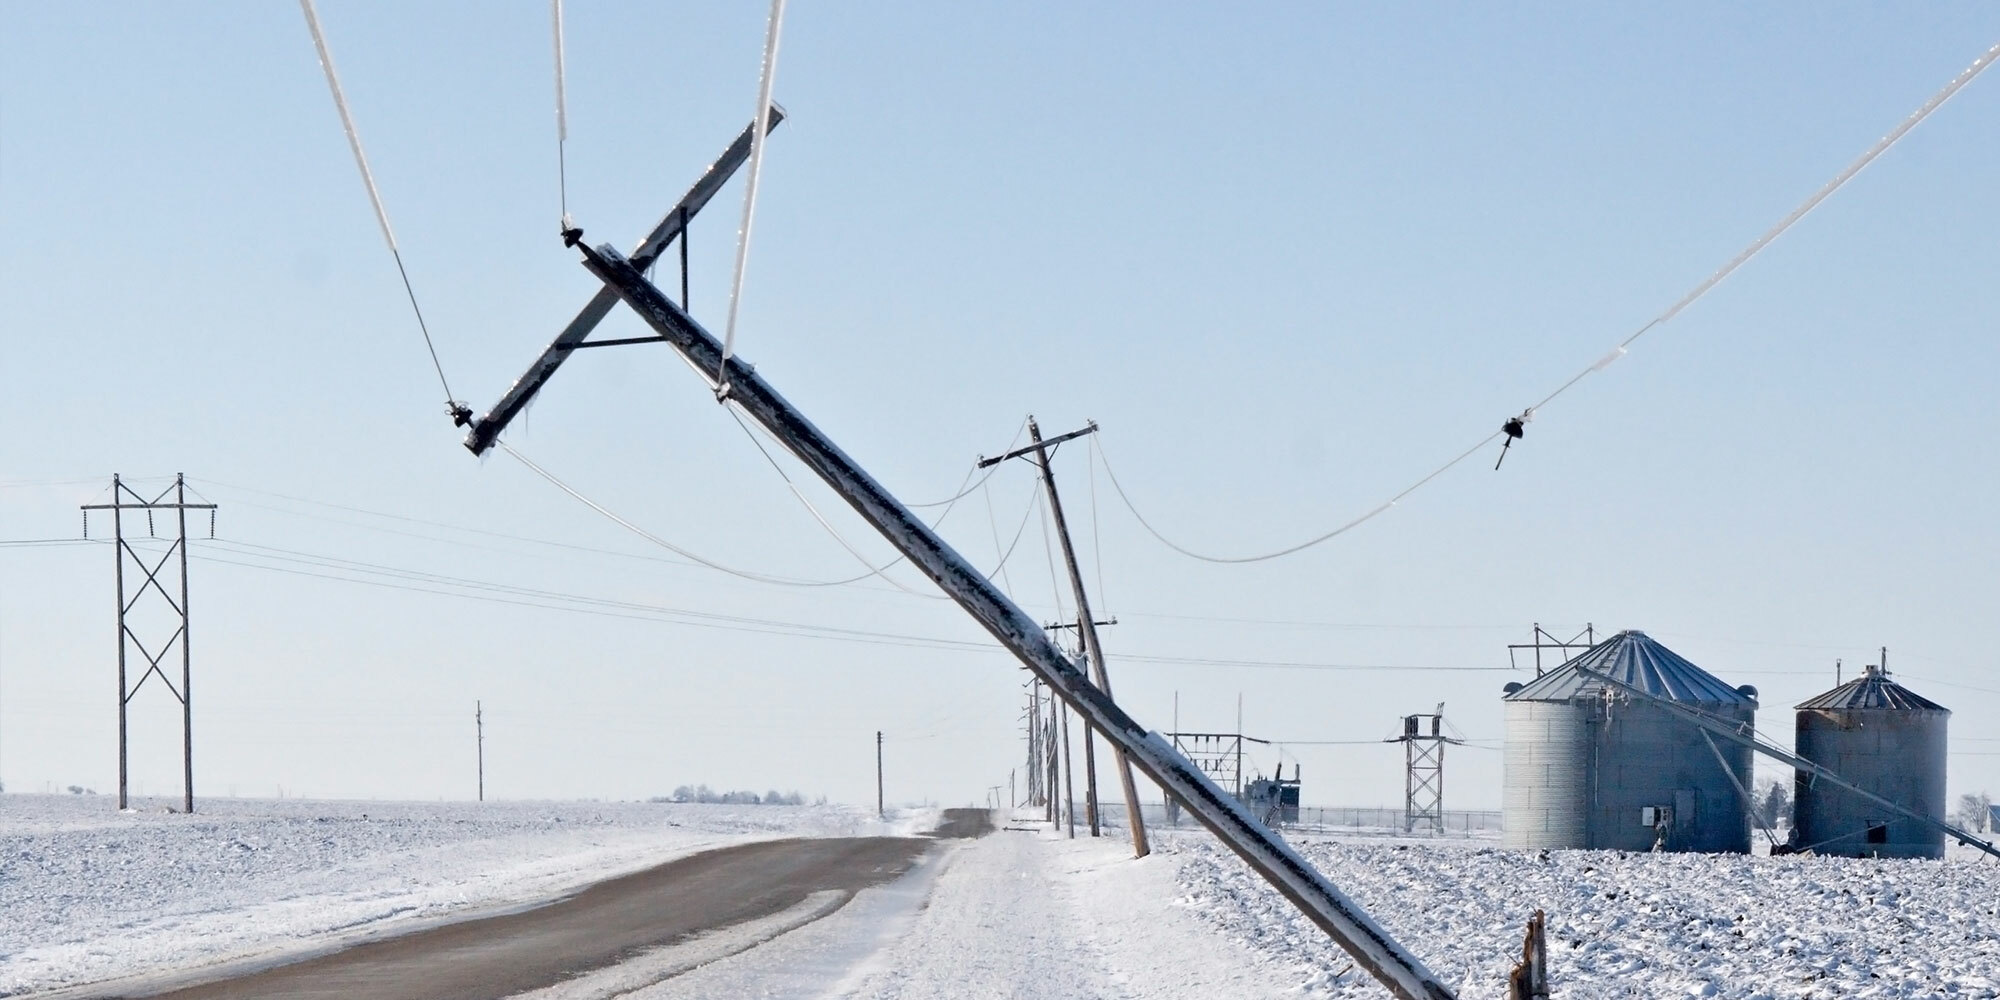 Ccs us blogpost winter storm impacts on business